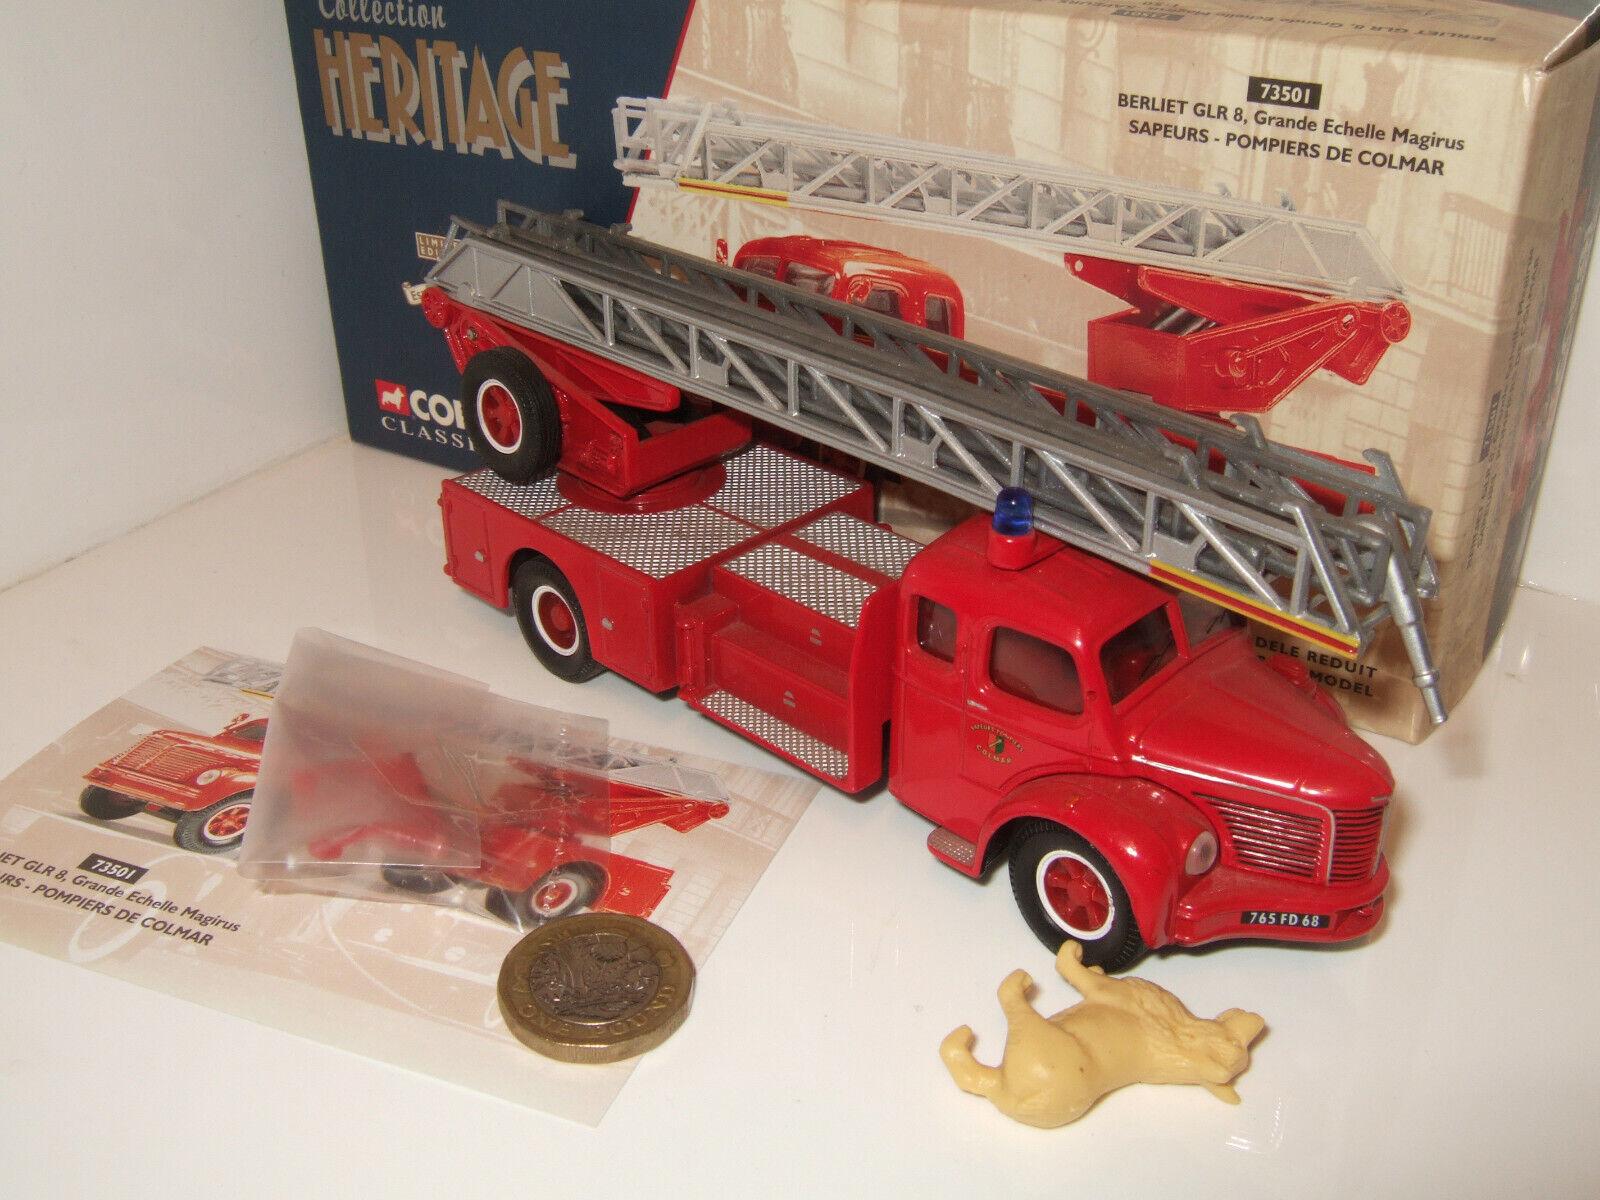 Corgi 73301 Berliet GLR 8 Fire Engine for Colmar Diecast Model in 1 50 Scale